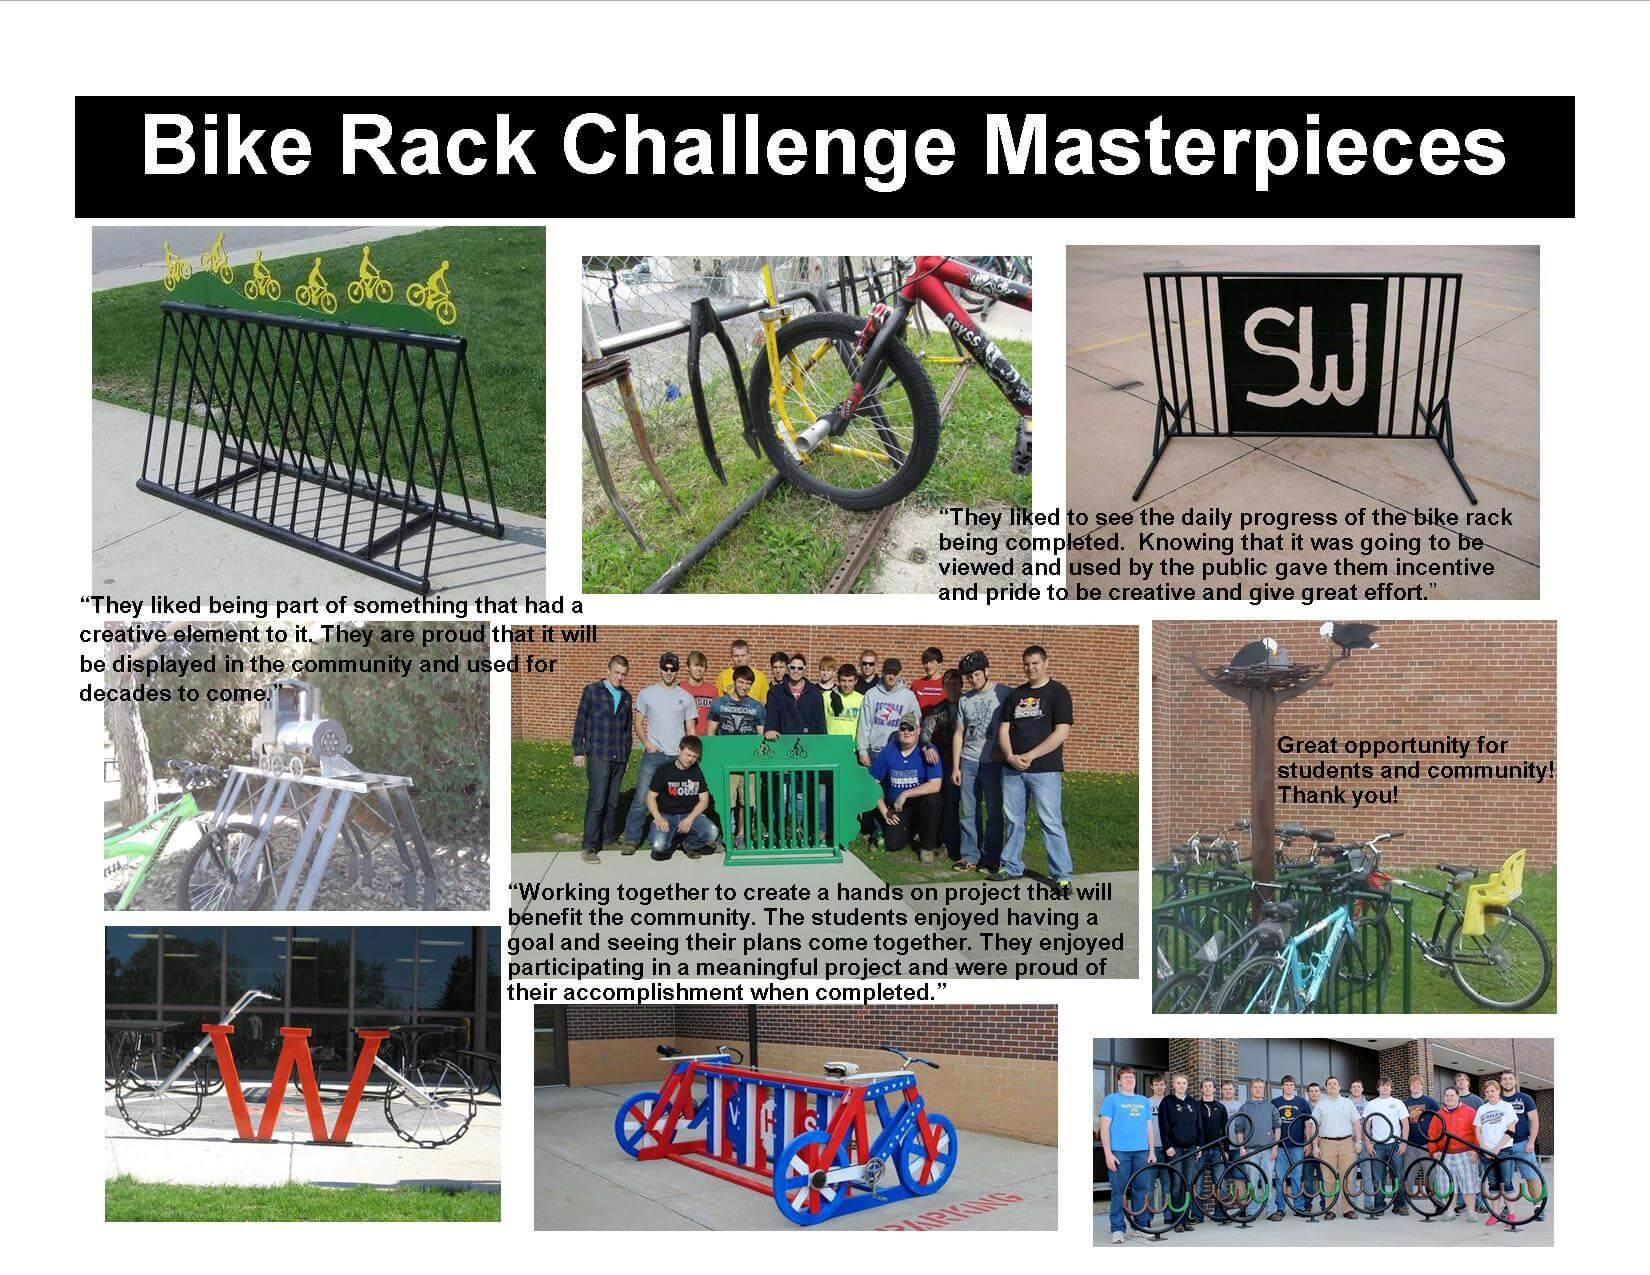 Bike Rack Challenge Masterpieces through the years...